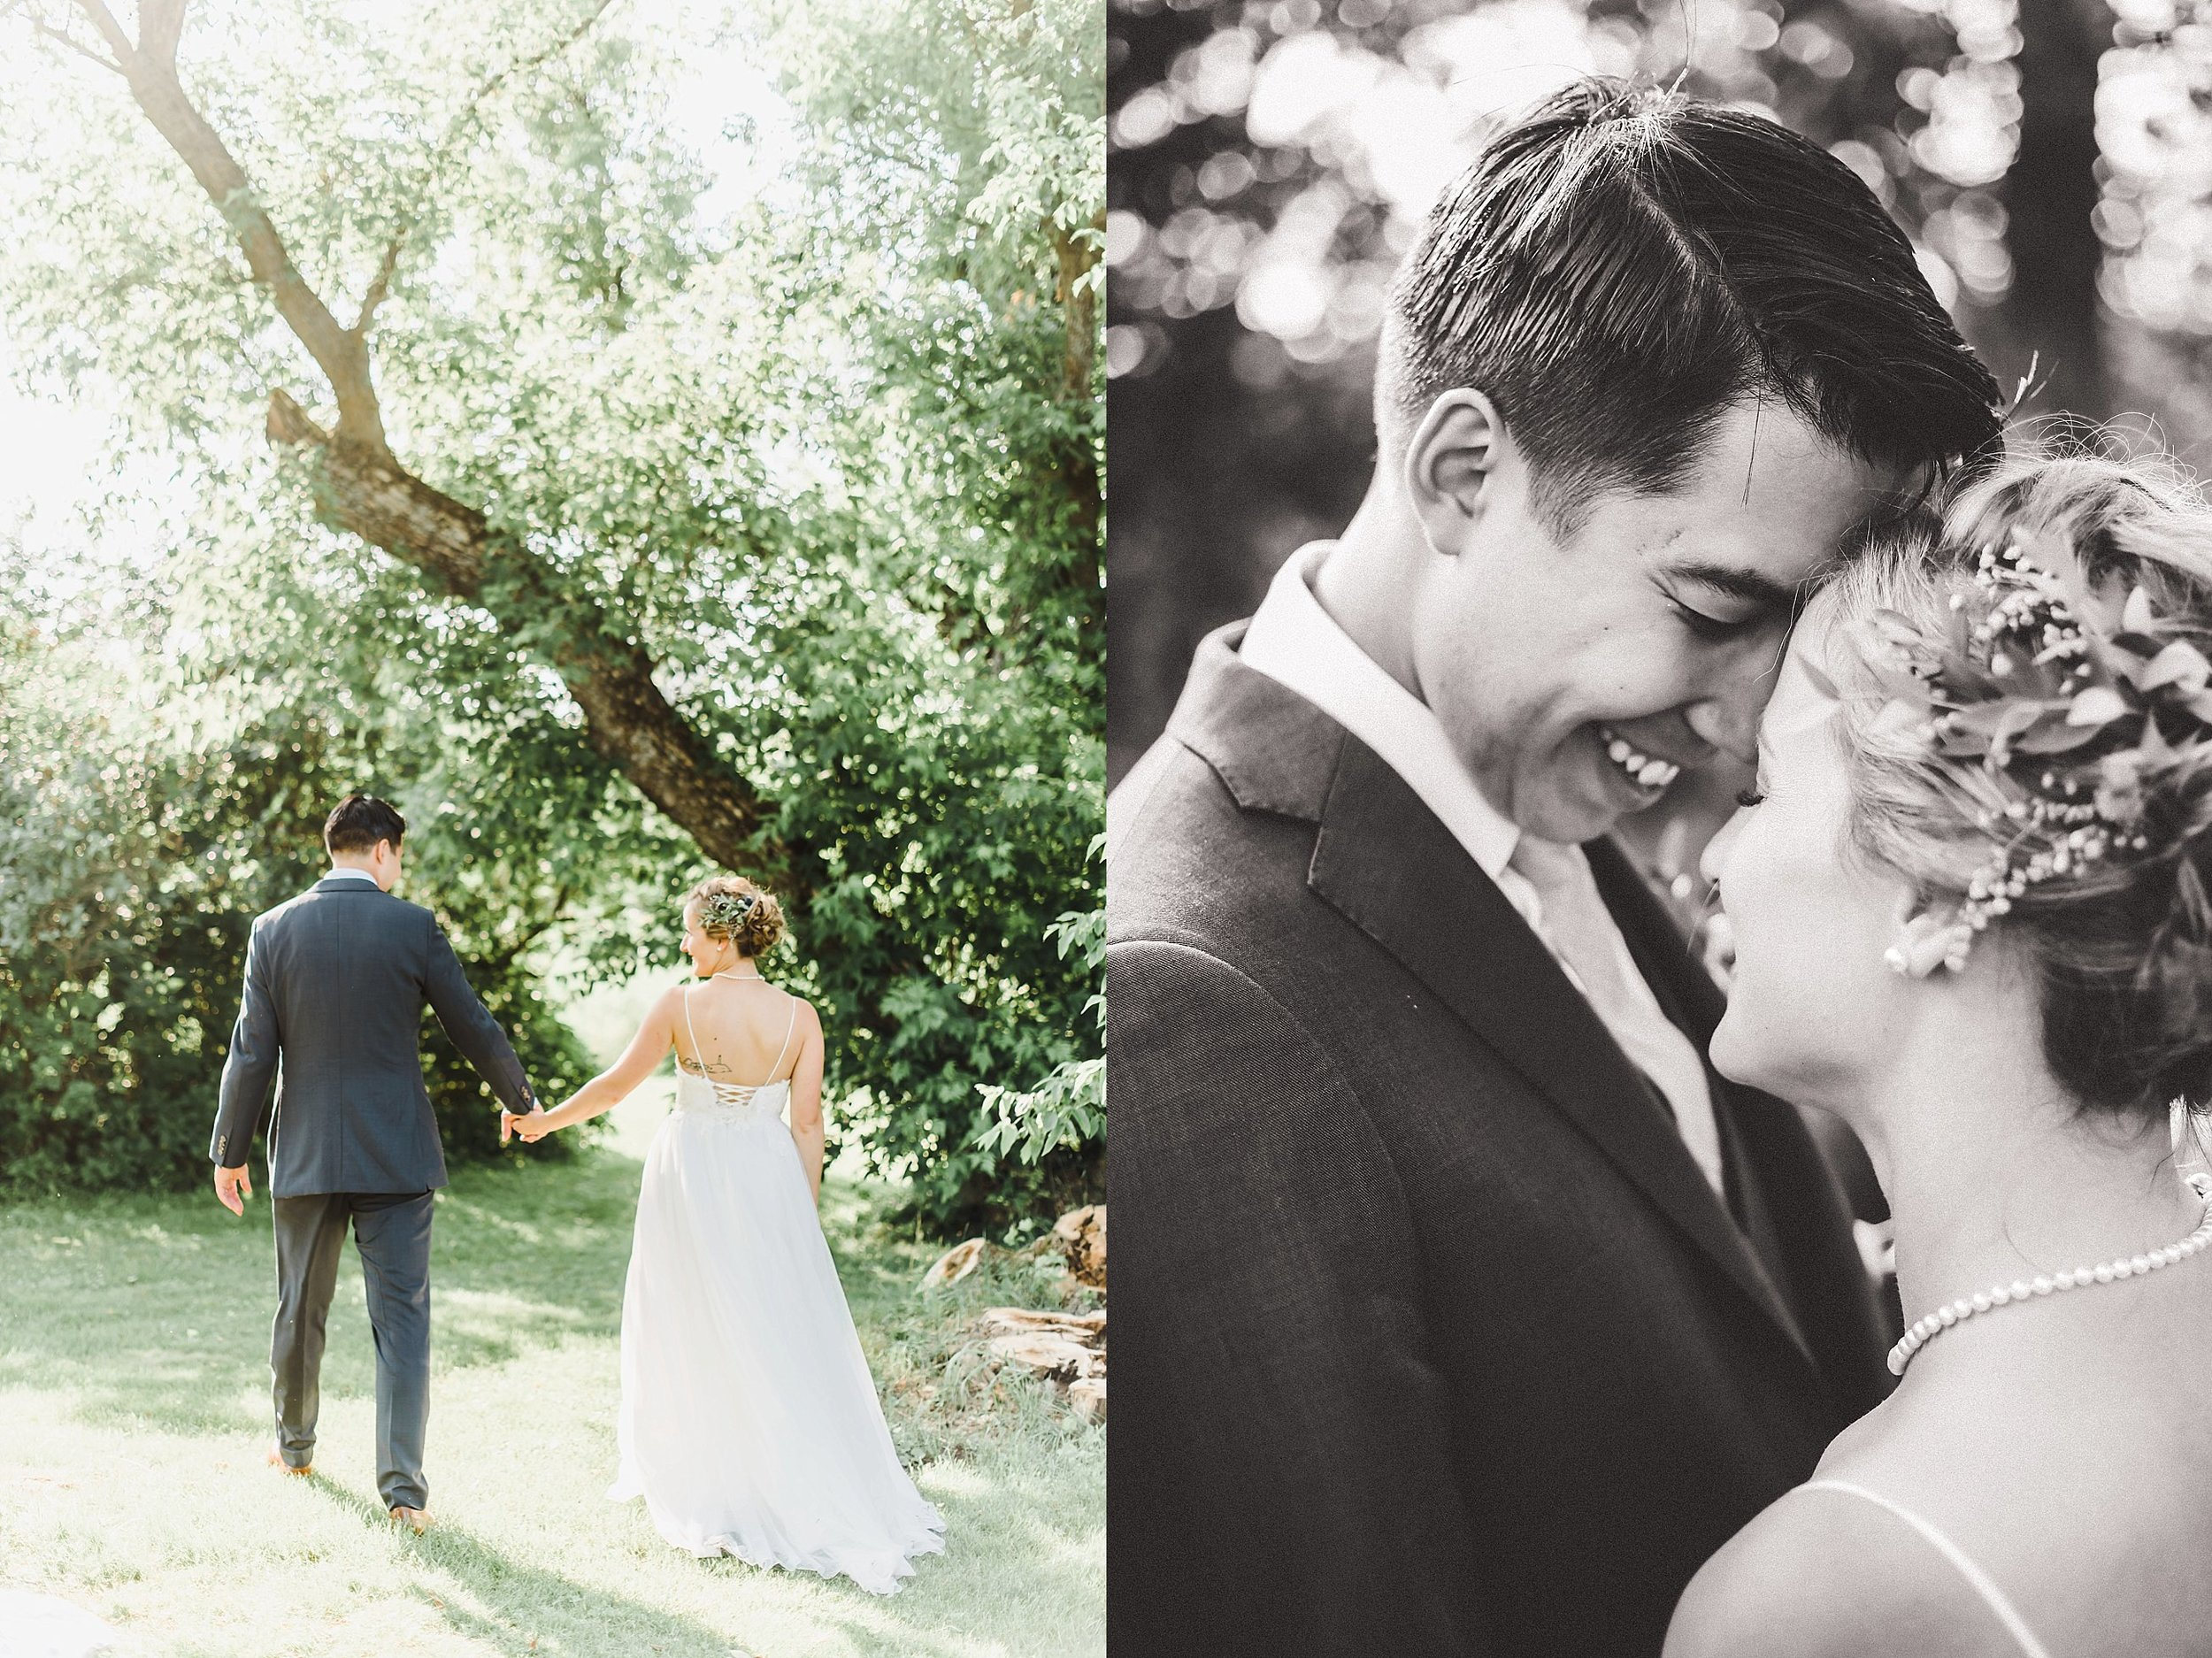 light airy indie fine art ottawa wedding photographer | Ali and Batoul Photography_0850.jpg